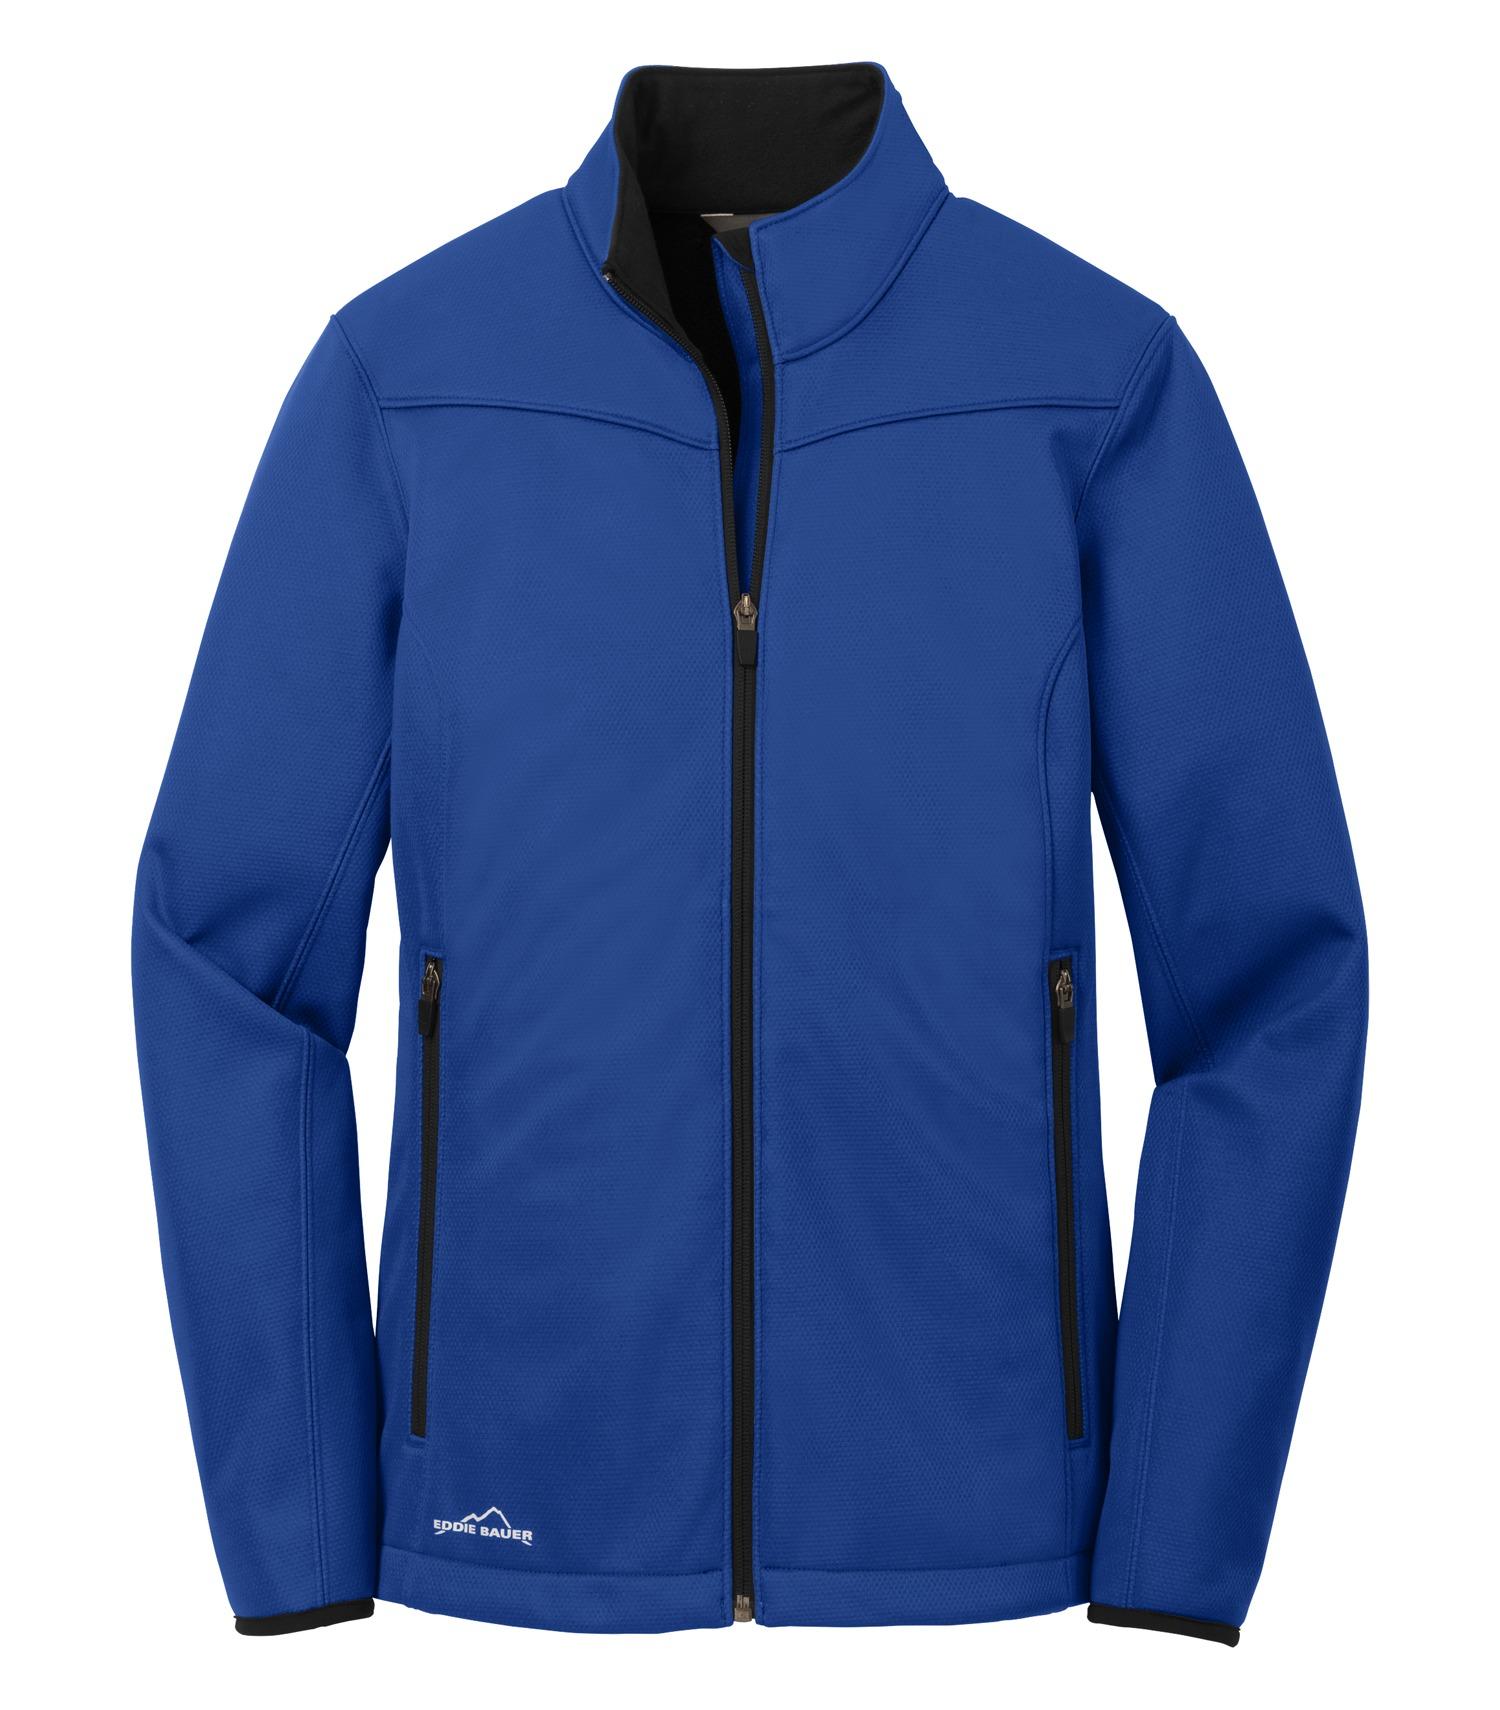 983dfb3cc5239 Eddie Bauer EB539 - Weather Resist Soft Shell Ladies' Jacket   Wordans